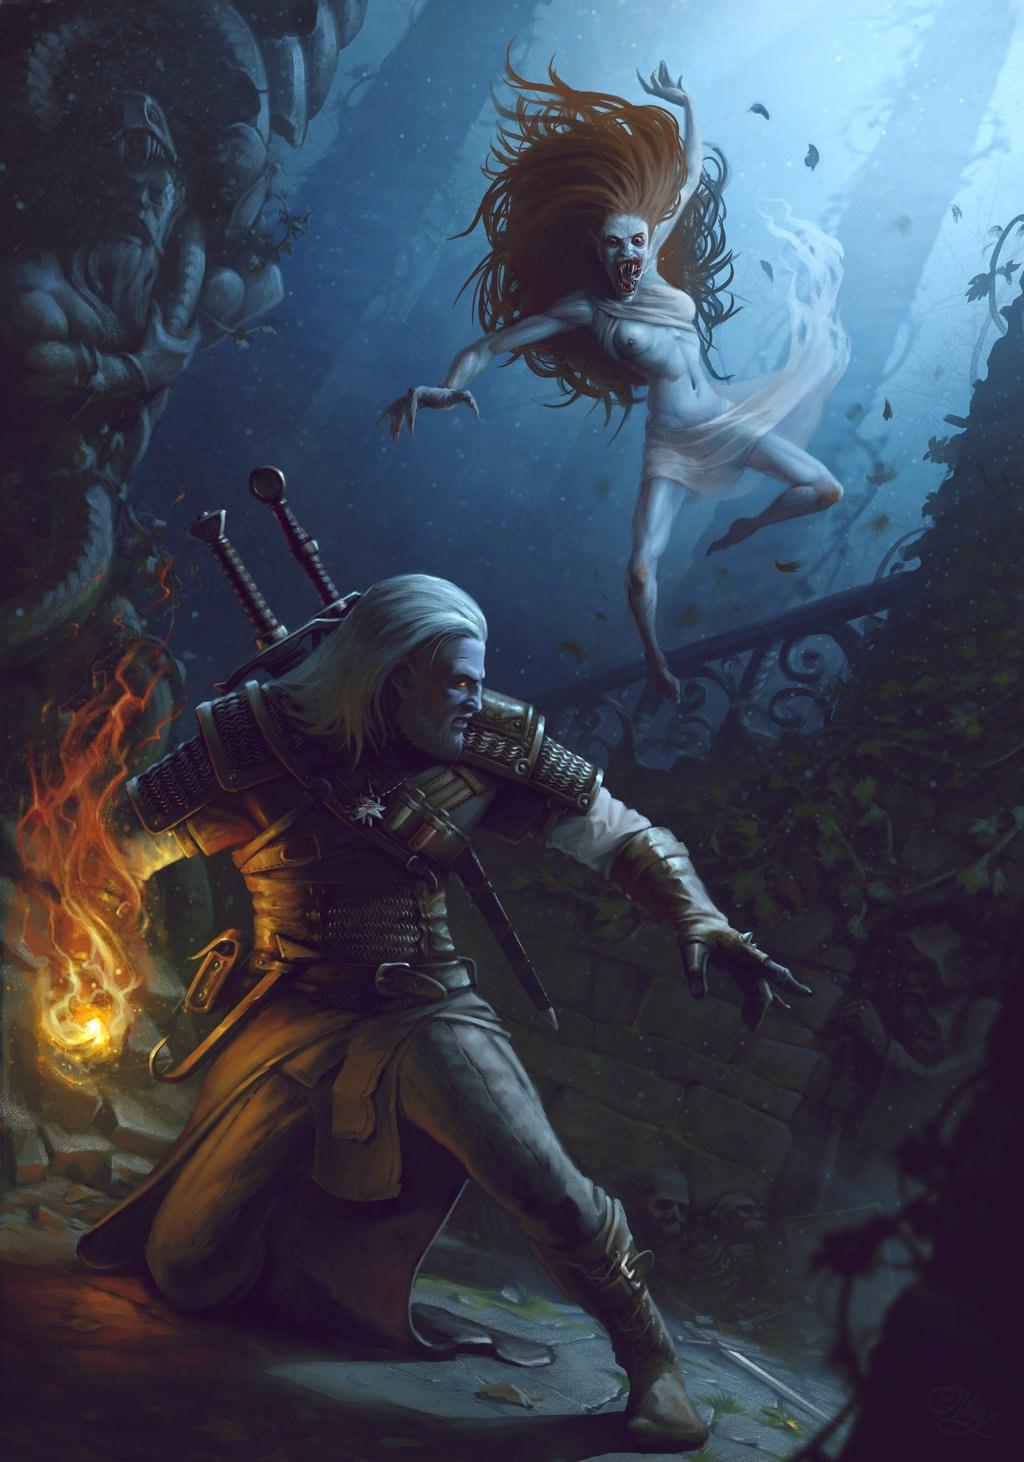 Арты - Witcher 3: Wild Hunt, the